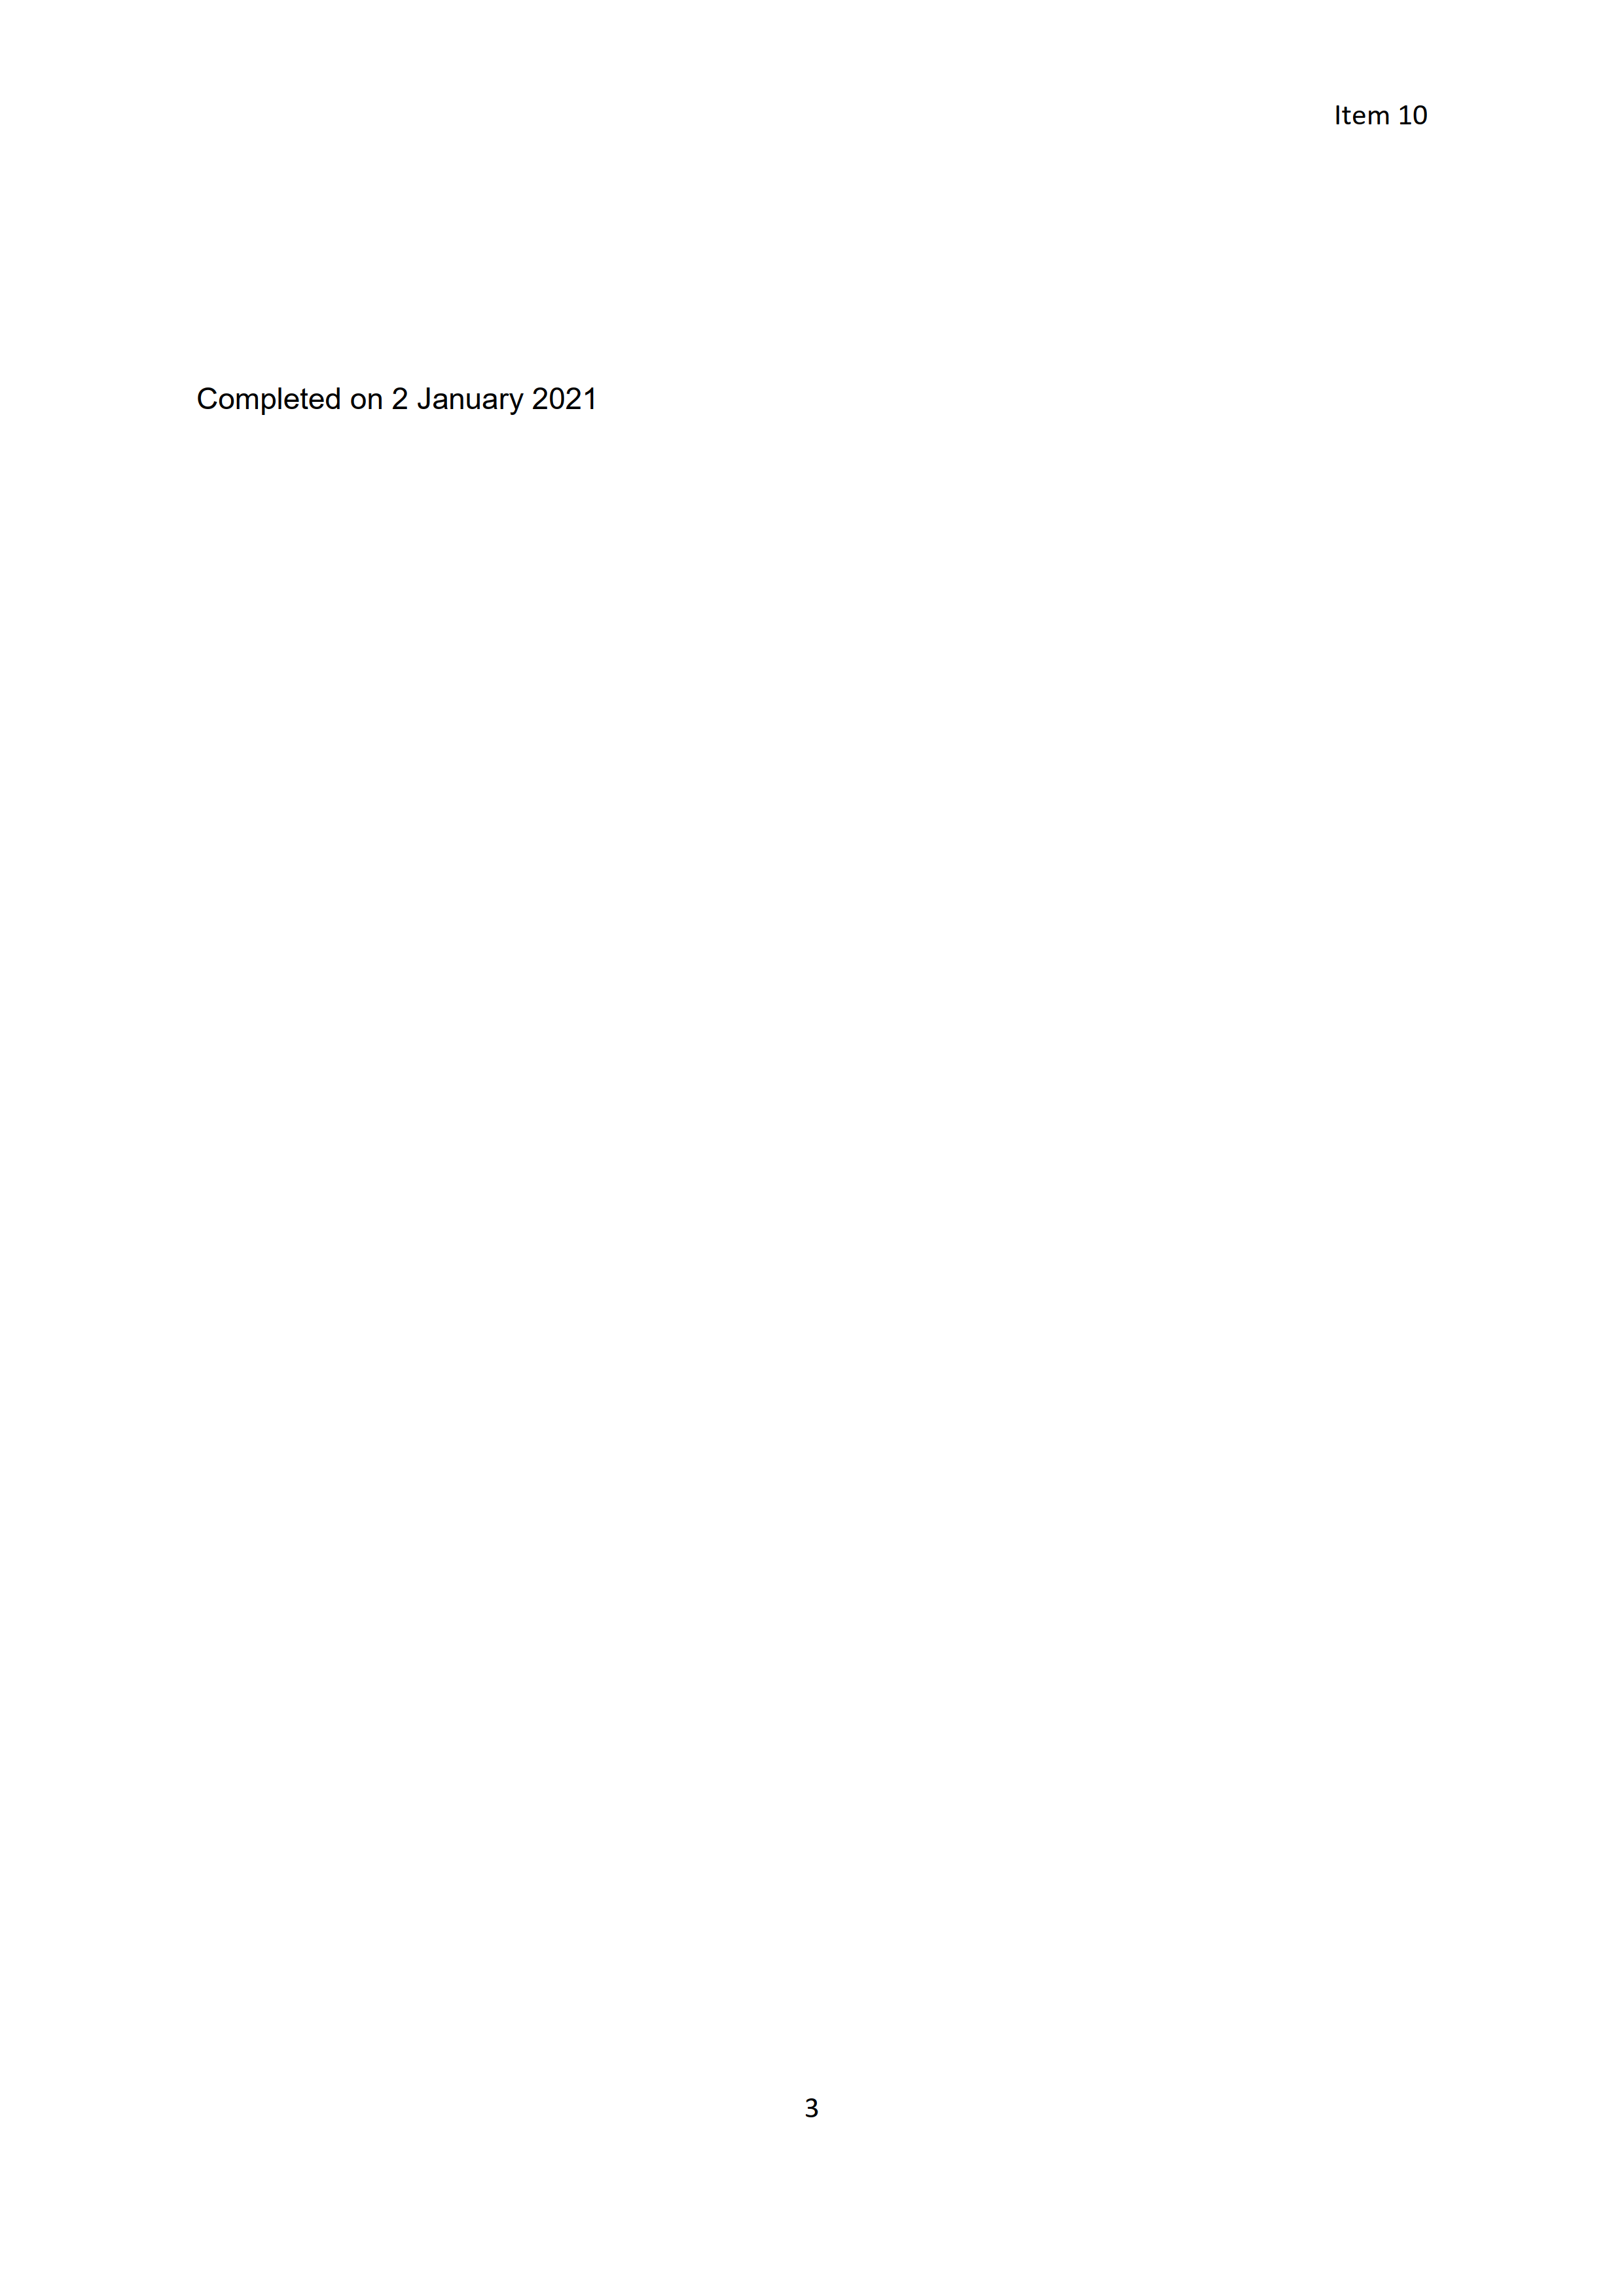 Item_10_Budget_Monitoring_report_3.png